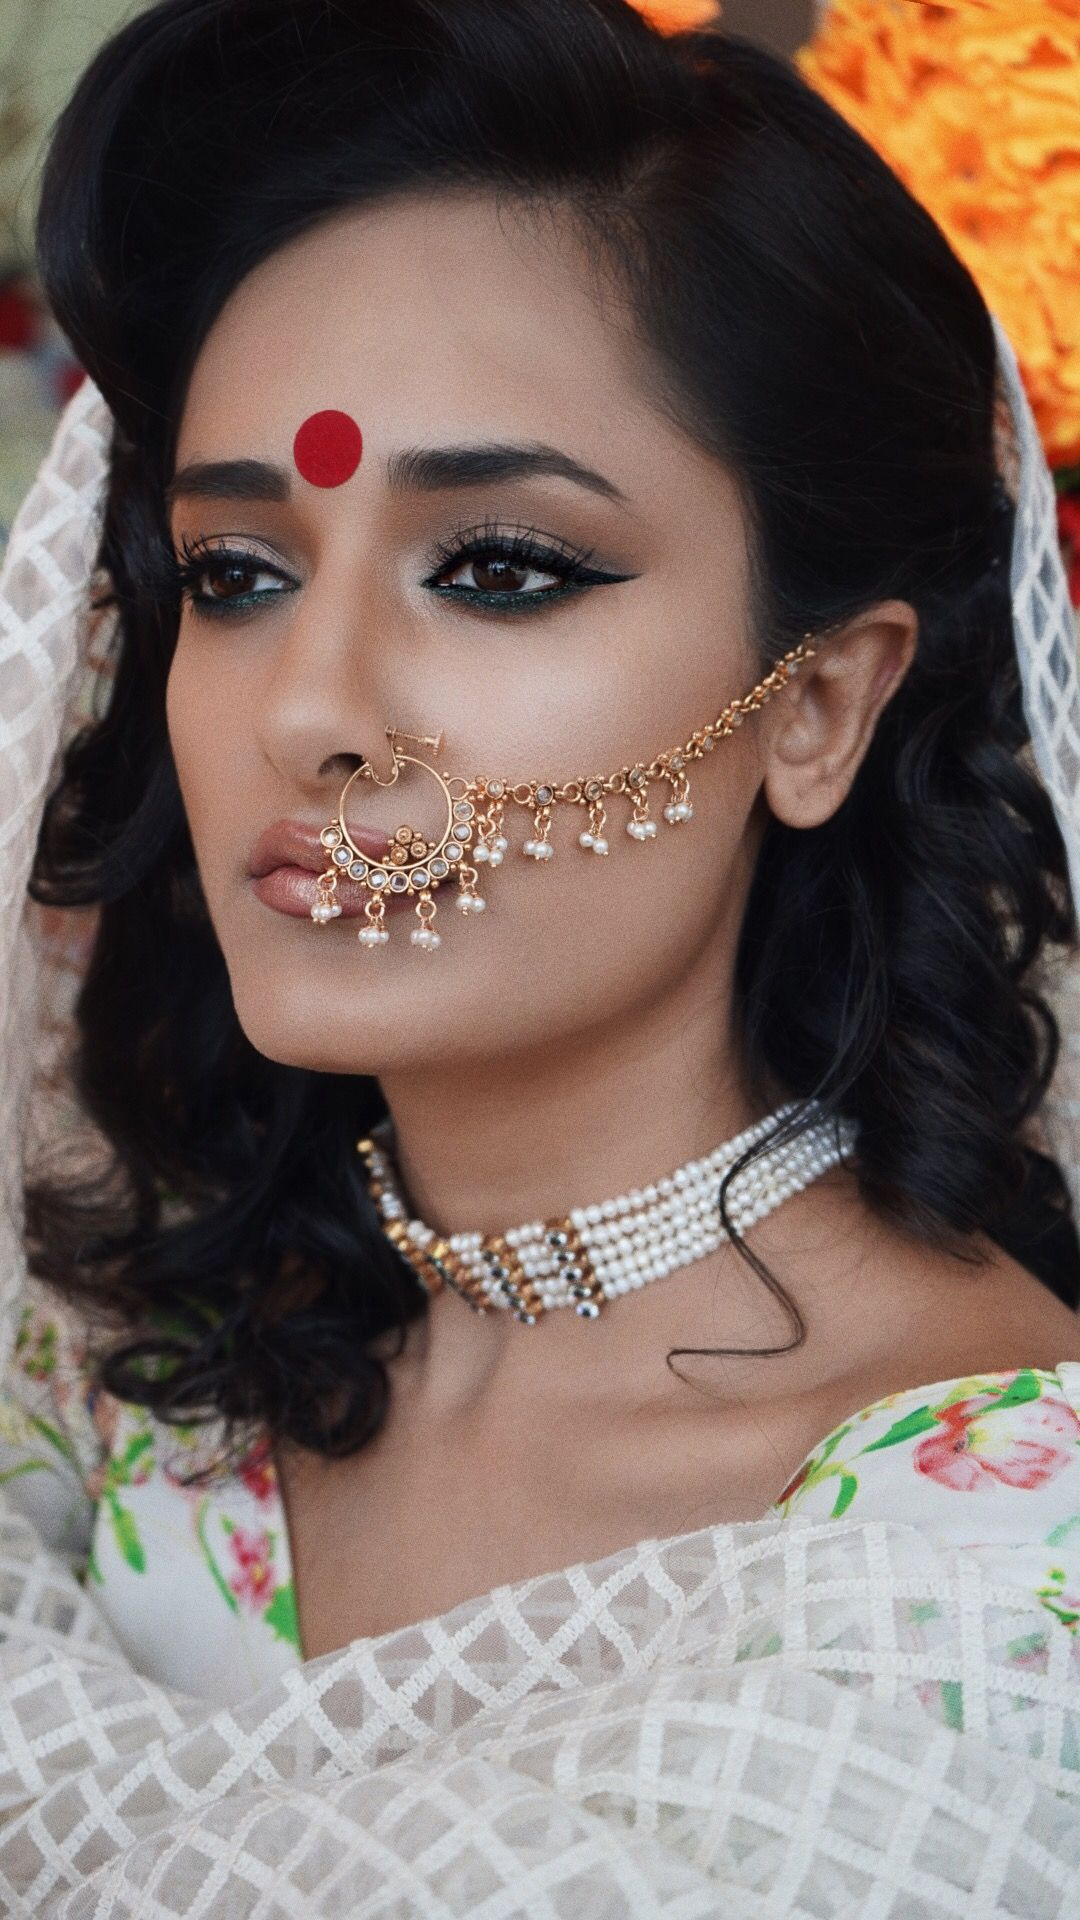 Hair Makeup Styling Www Ravbbeauty Com Indian Bridal Makeup Bridal Makeup Asian Inspired Wedding